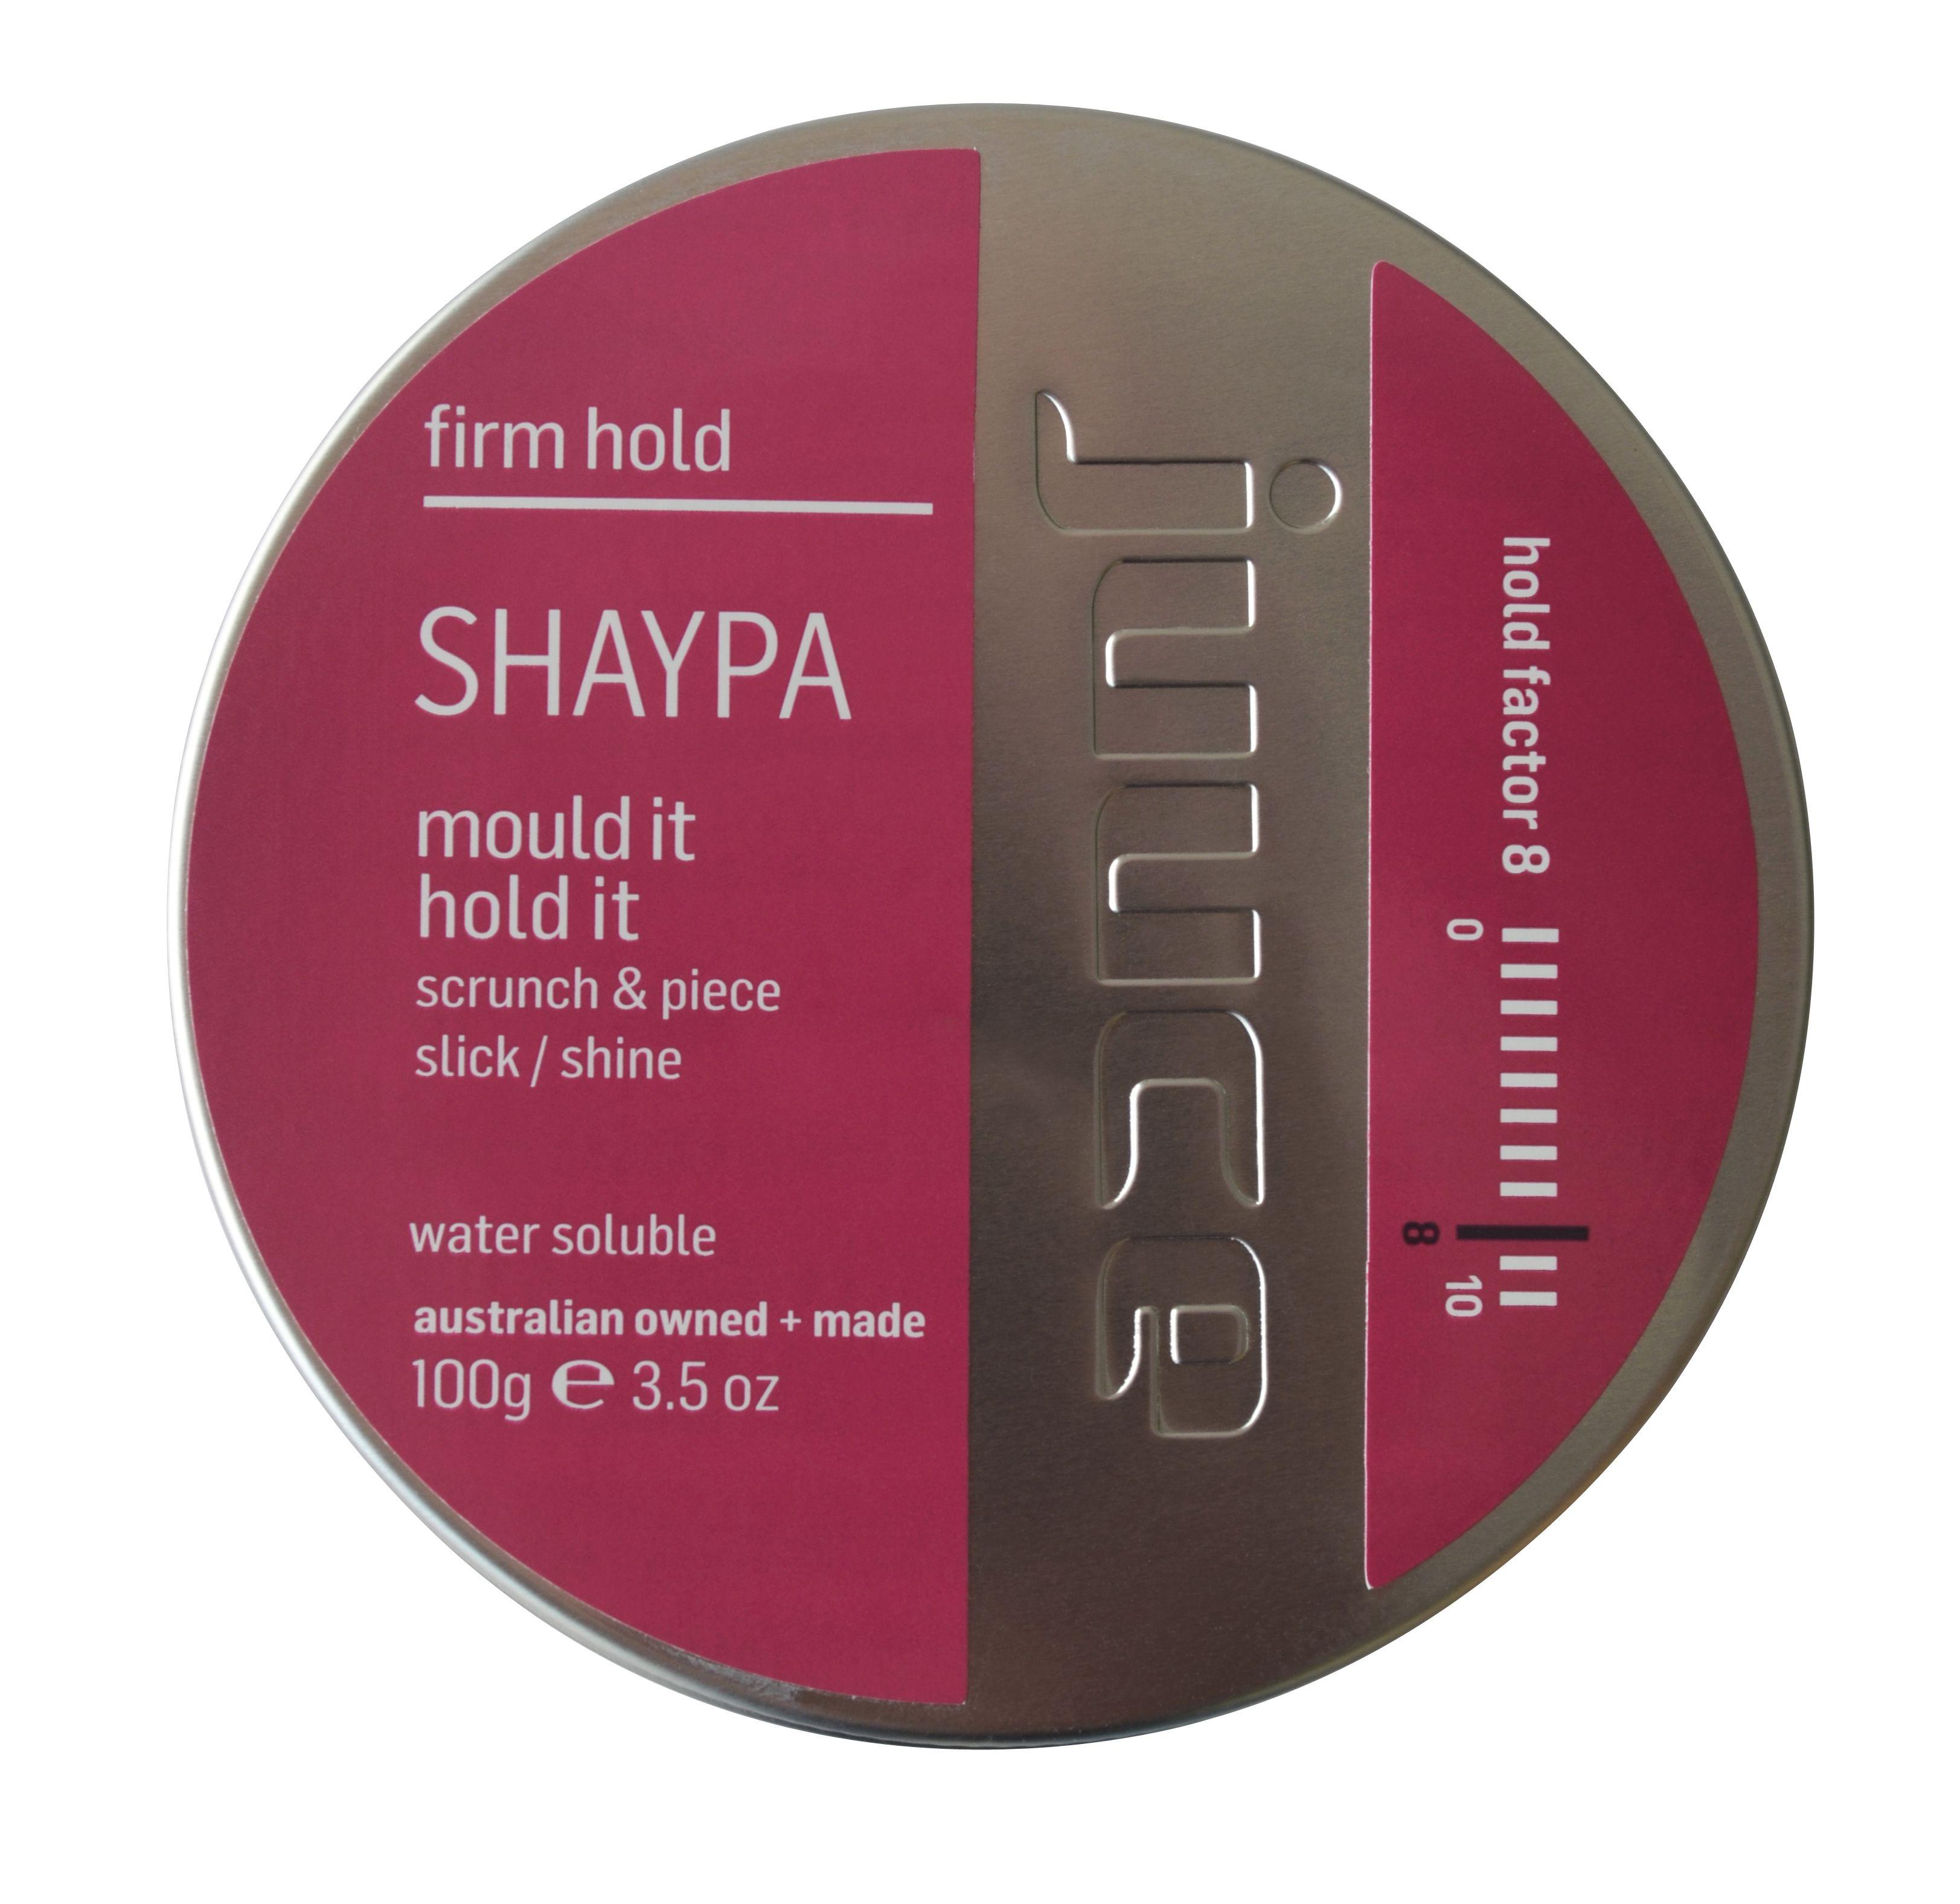 Shaypa